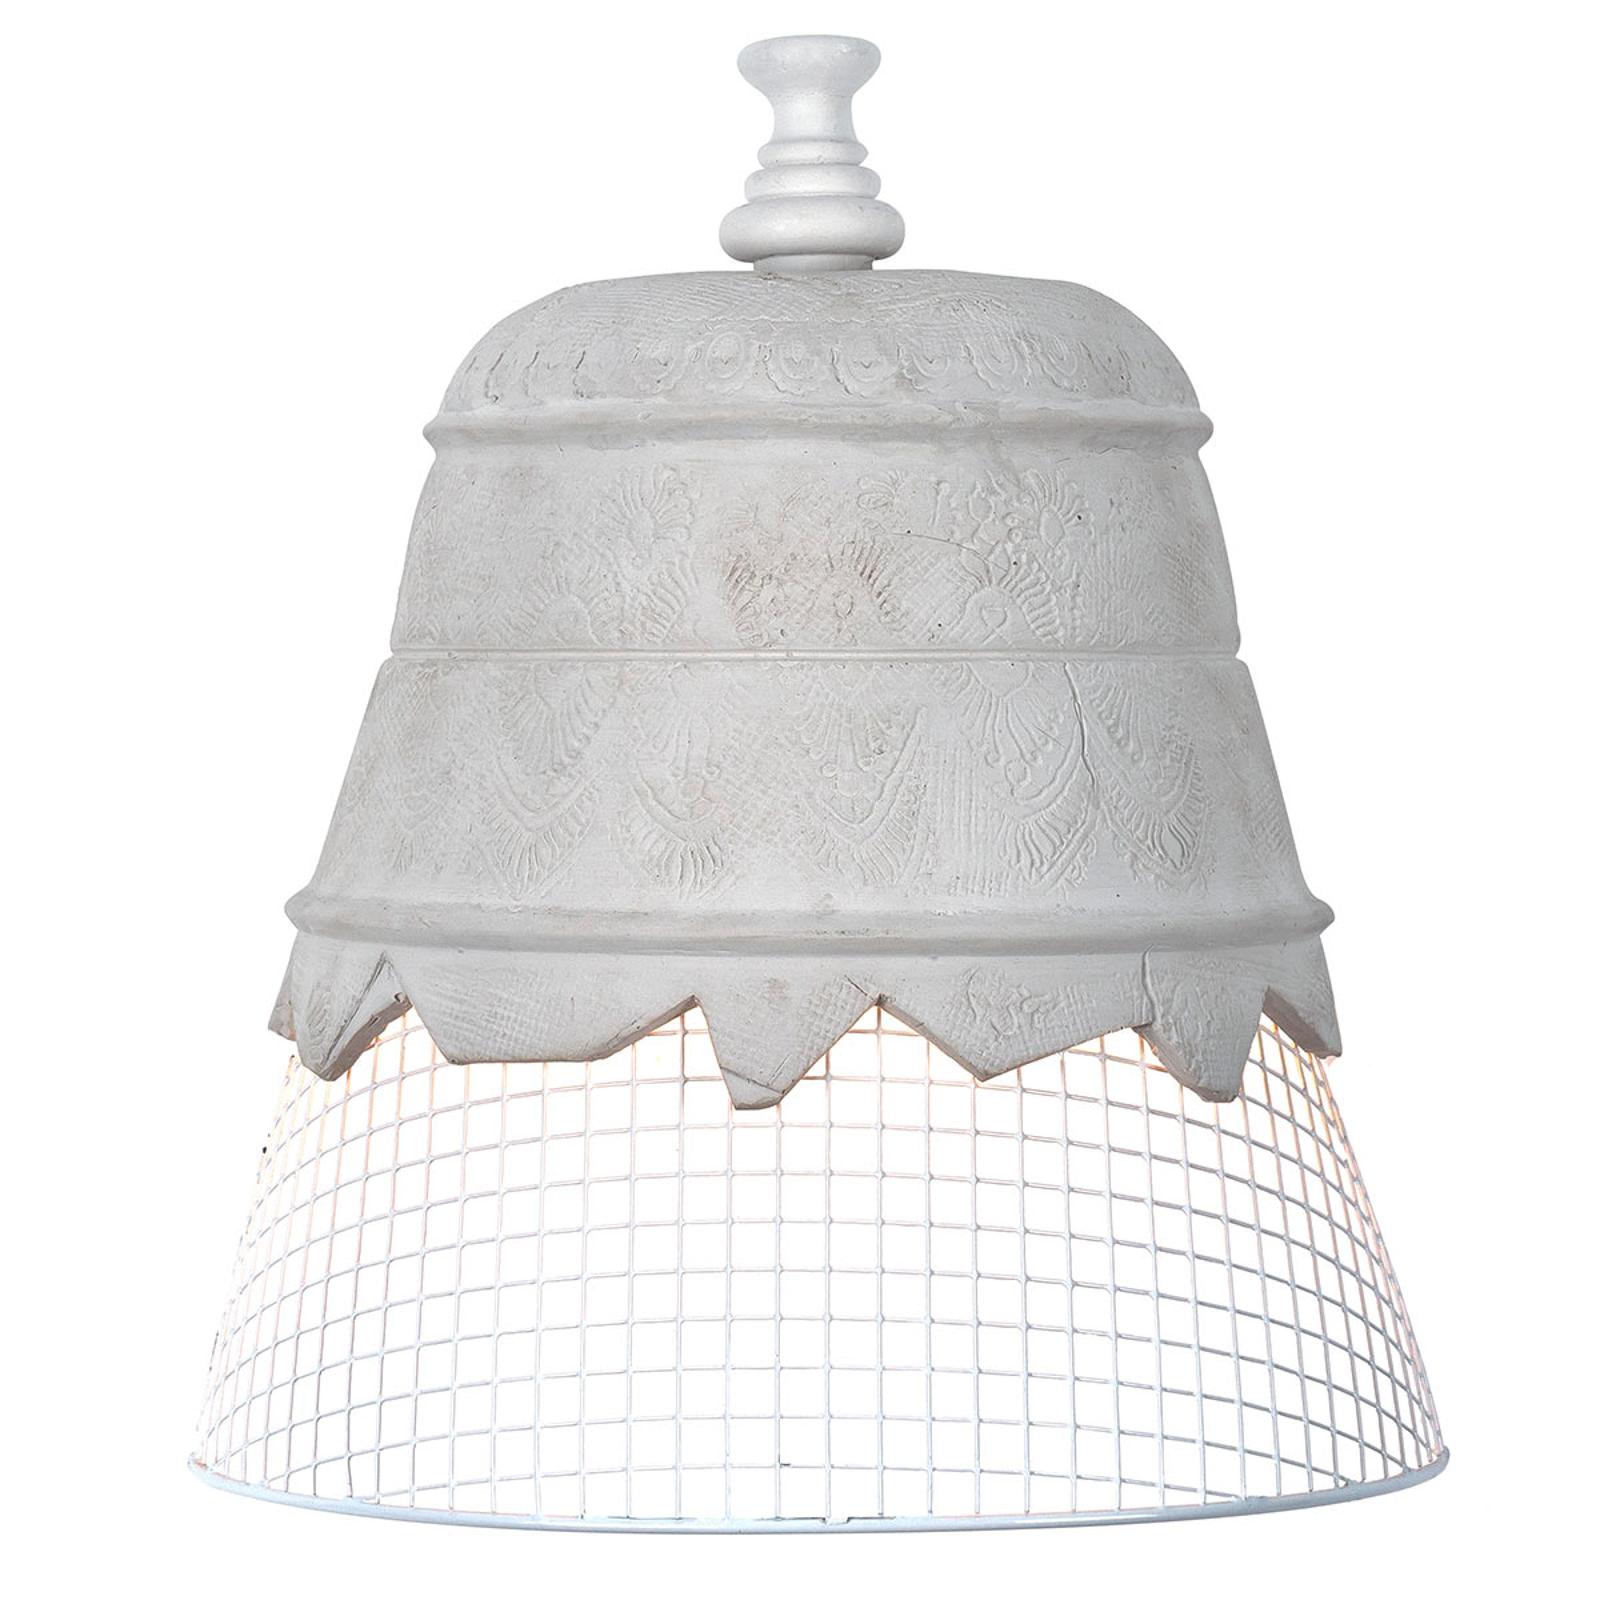 Karman Domenica wandlamp van gips, wit